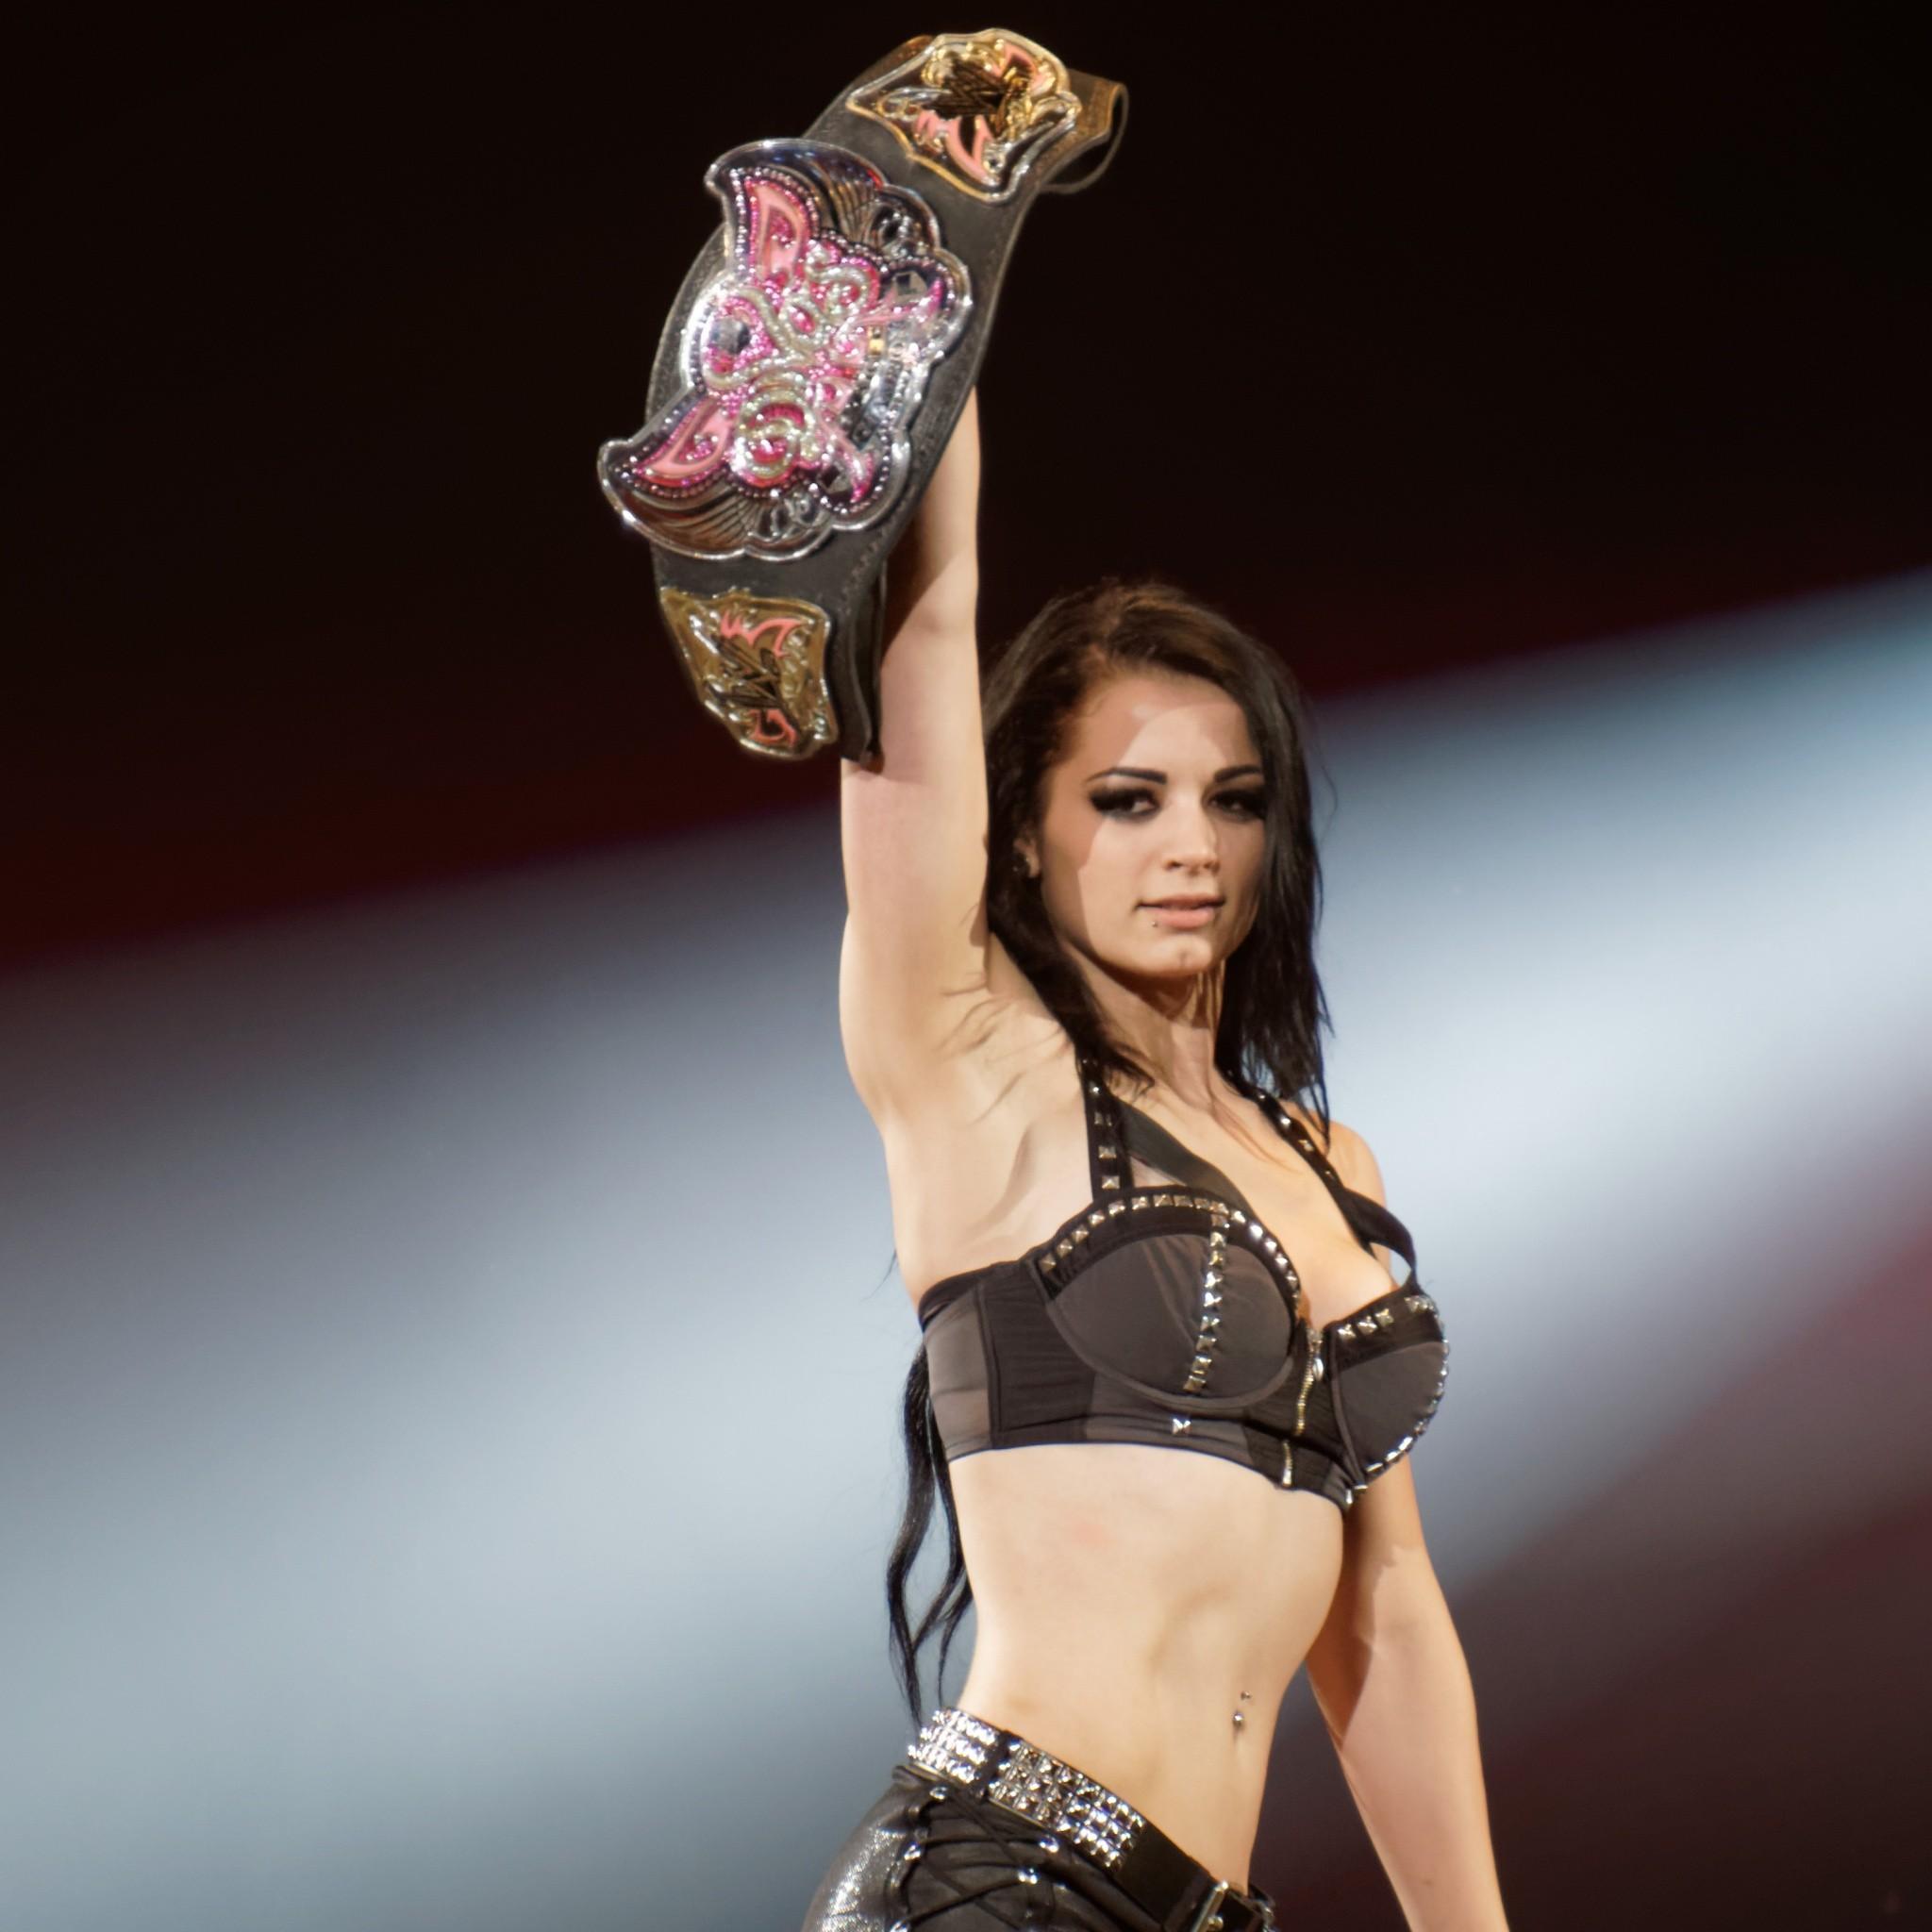 Download WWE Divas Champion 2048 x 2048 Wallpapers – 4571098 – sport  entertainment wwenxt wrestling smackdown rebuild series raw   mobile9